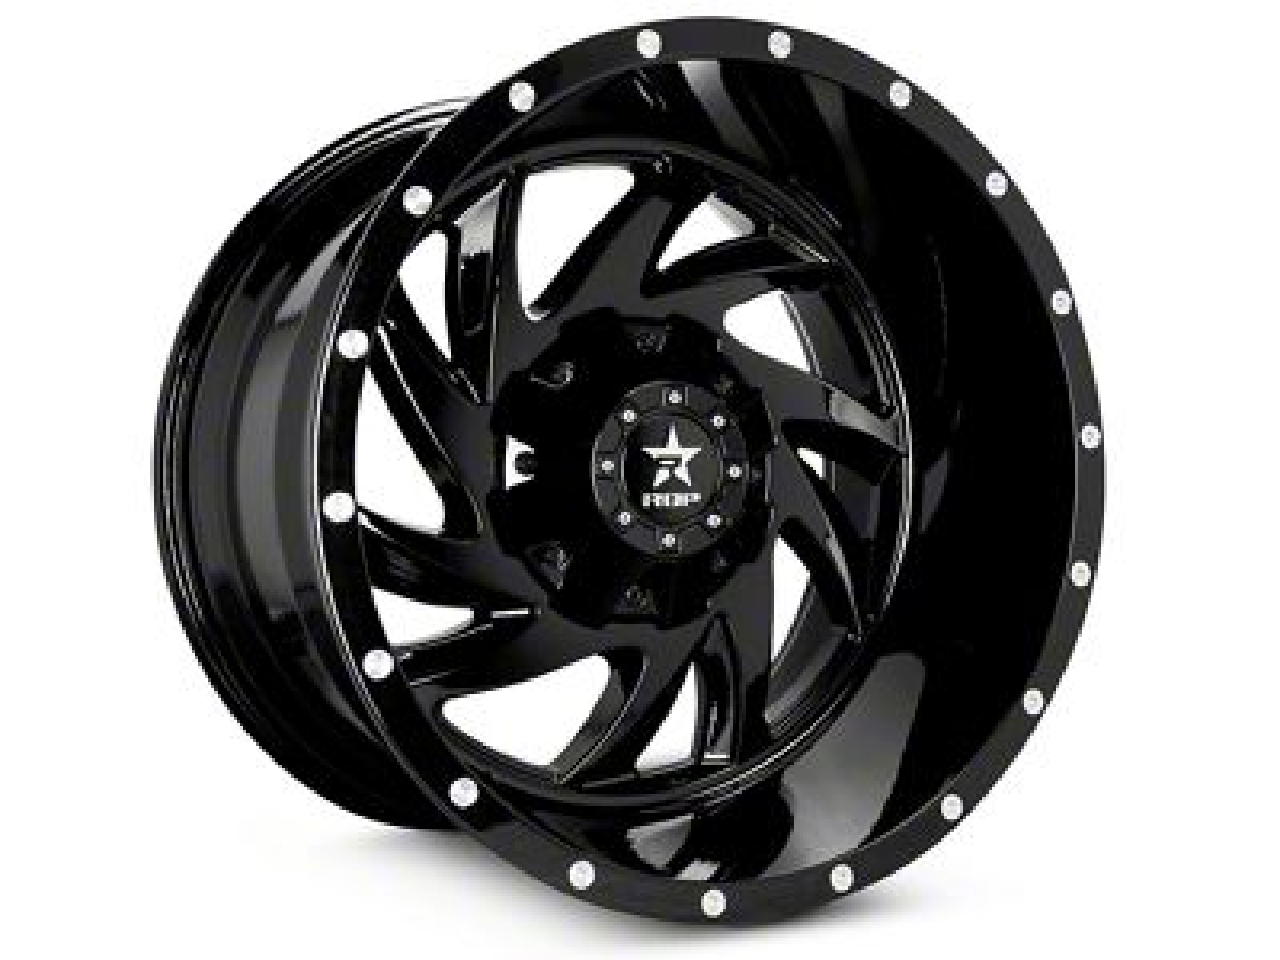 rbp ram 66r hk 5 gloss black 5 lug wheel 20x9 r101829 02 17 ram 2005 Dodge 1500 Tie Rods rbp 66r hk 5 gloss black 5 lug wheel 20x9 02